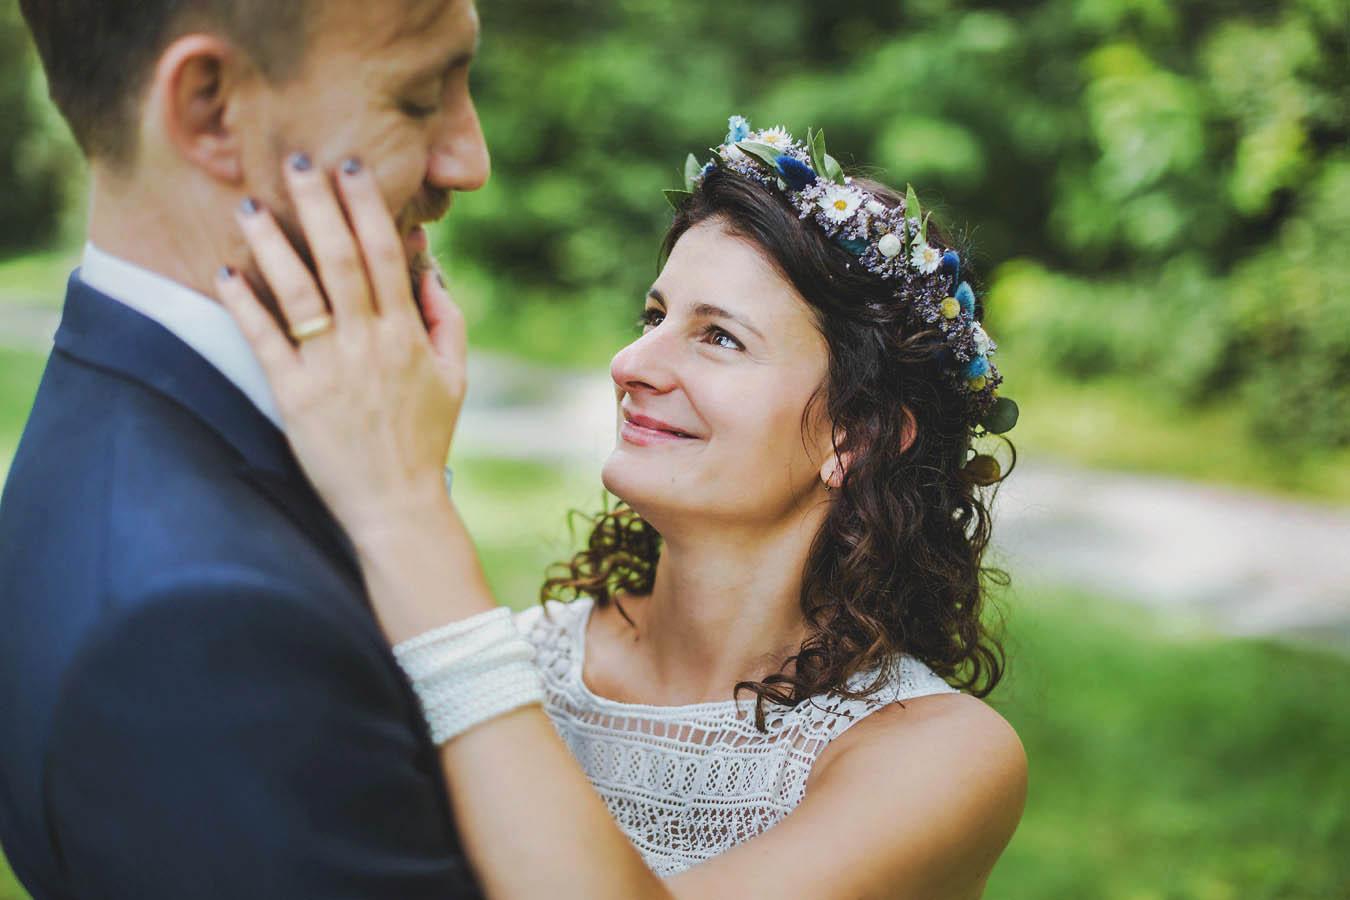 Hochzeitsfotograf Berlin Fotoshooting